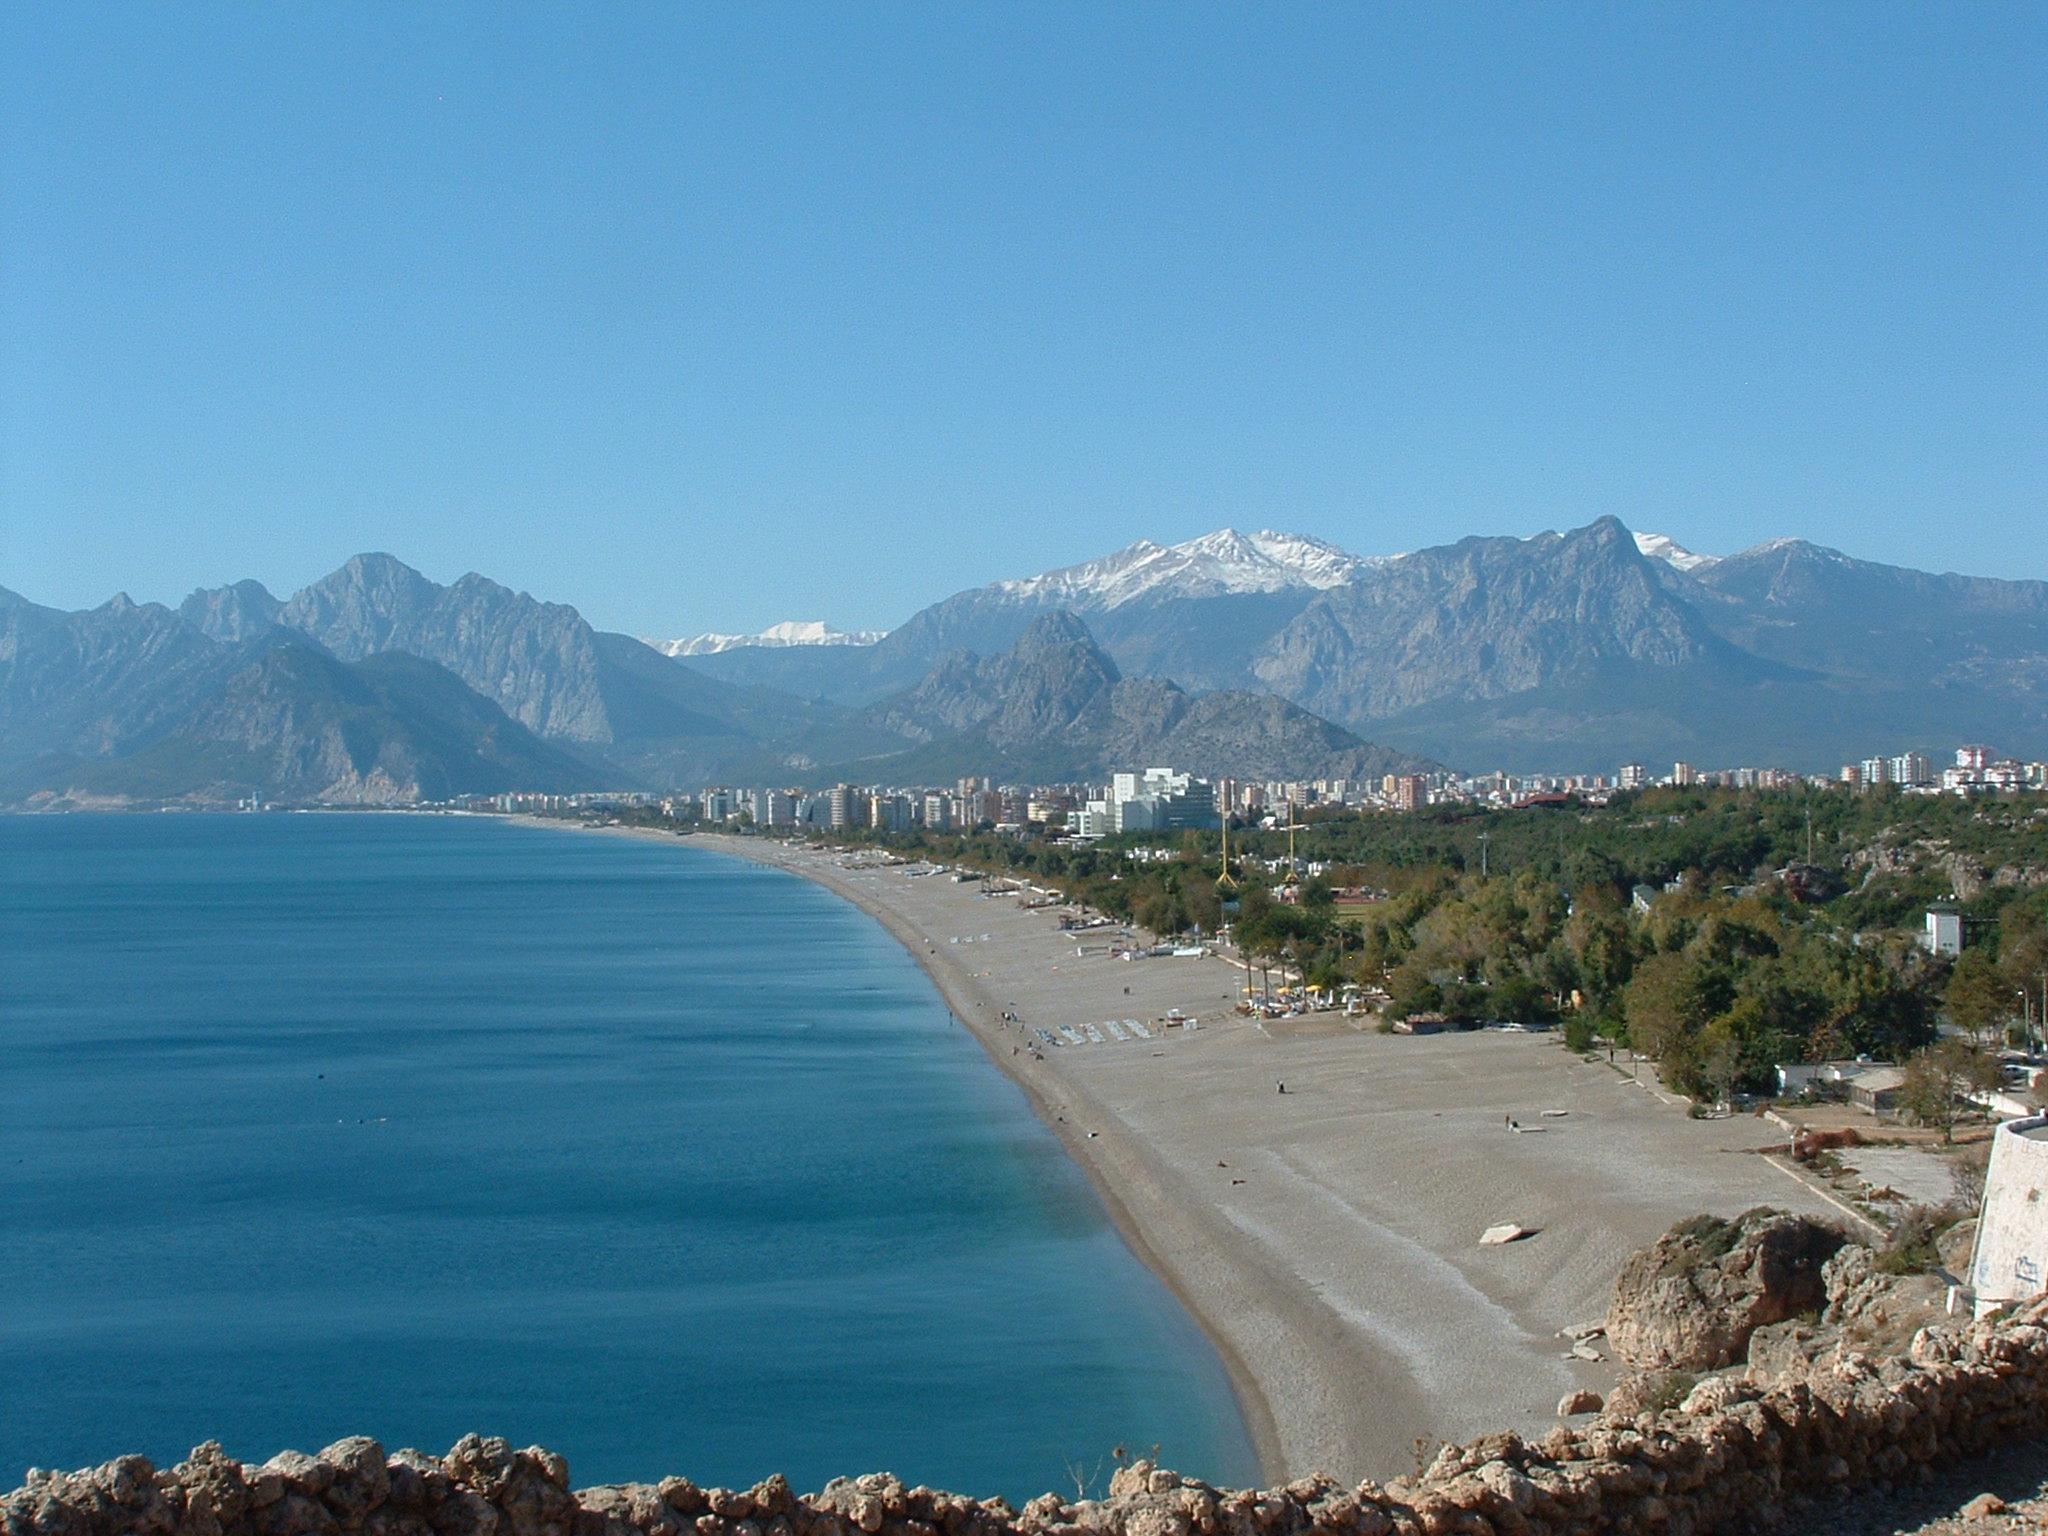 Antalya beach copy.jpg